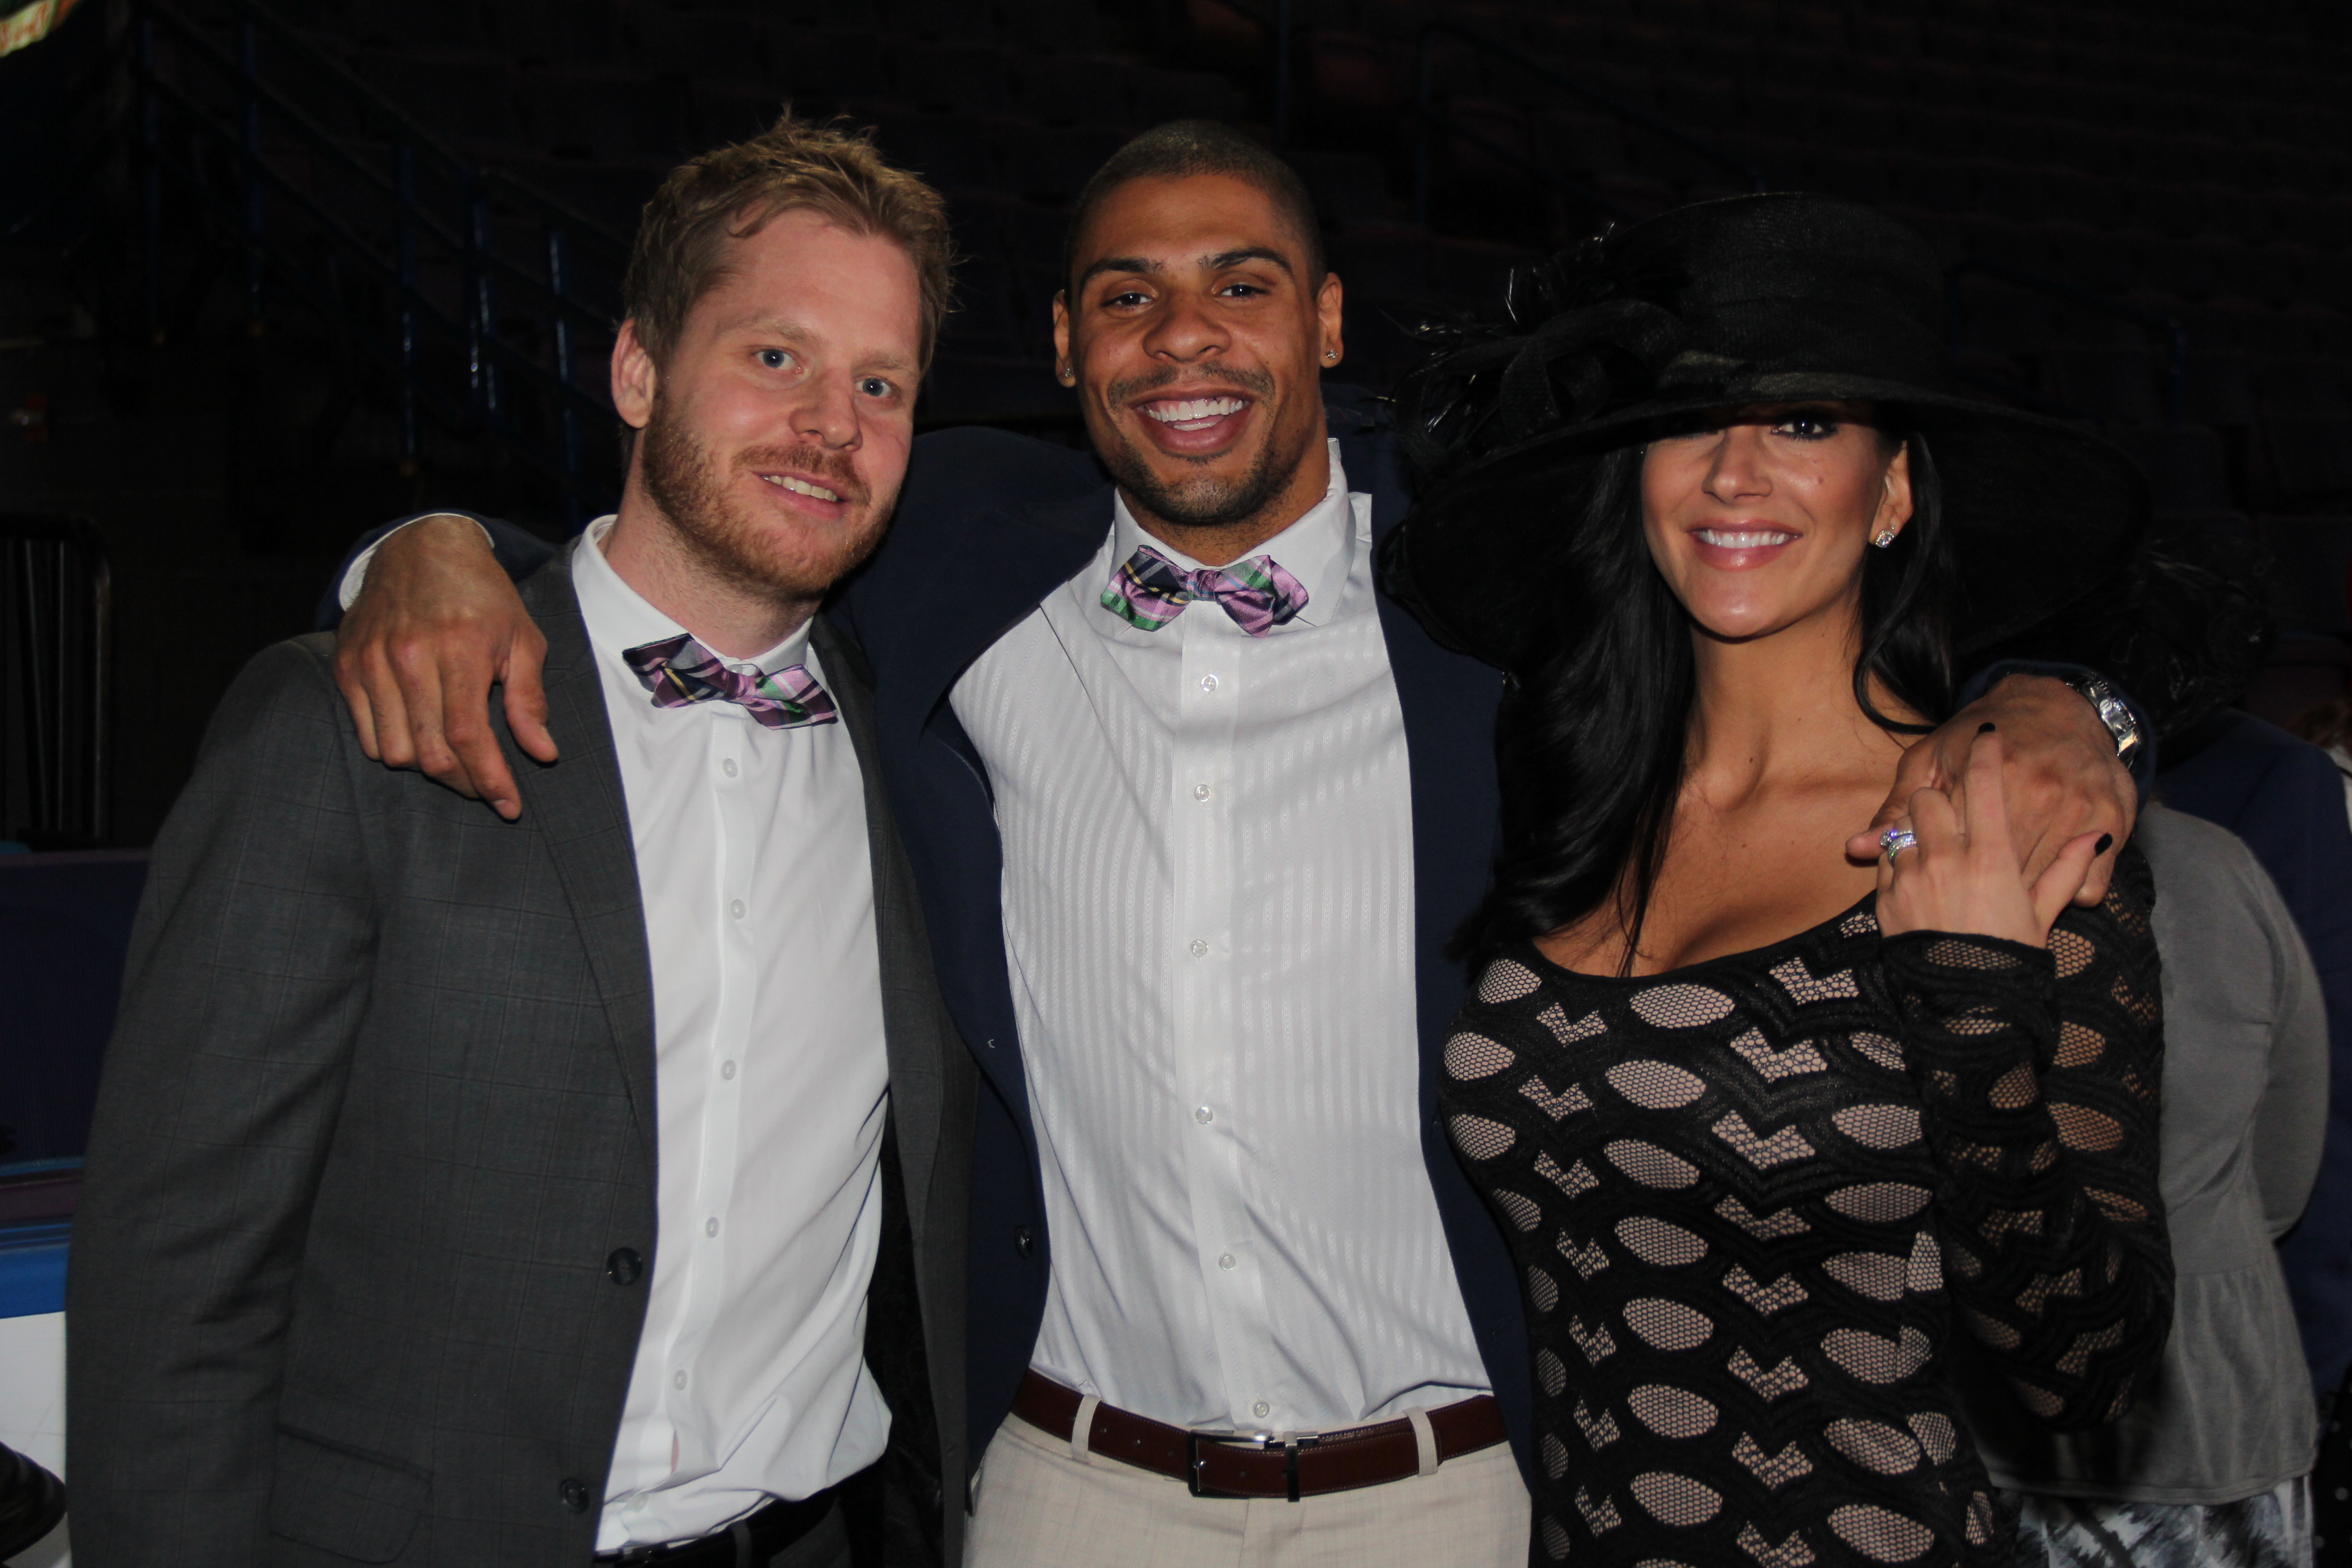 Blues forwards Jaden Schwartz, Ryan Reaves with Alanna Reaves